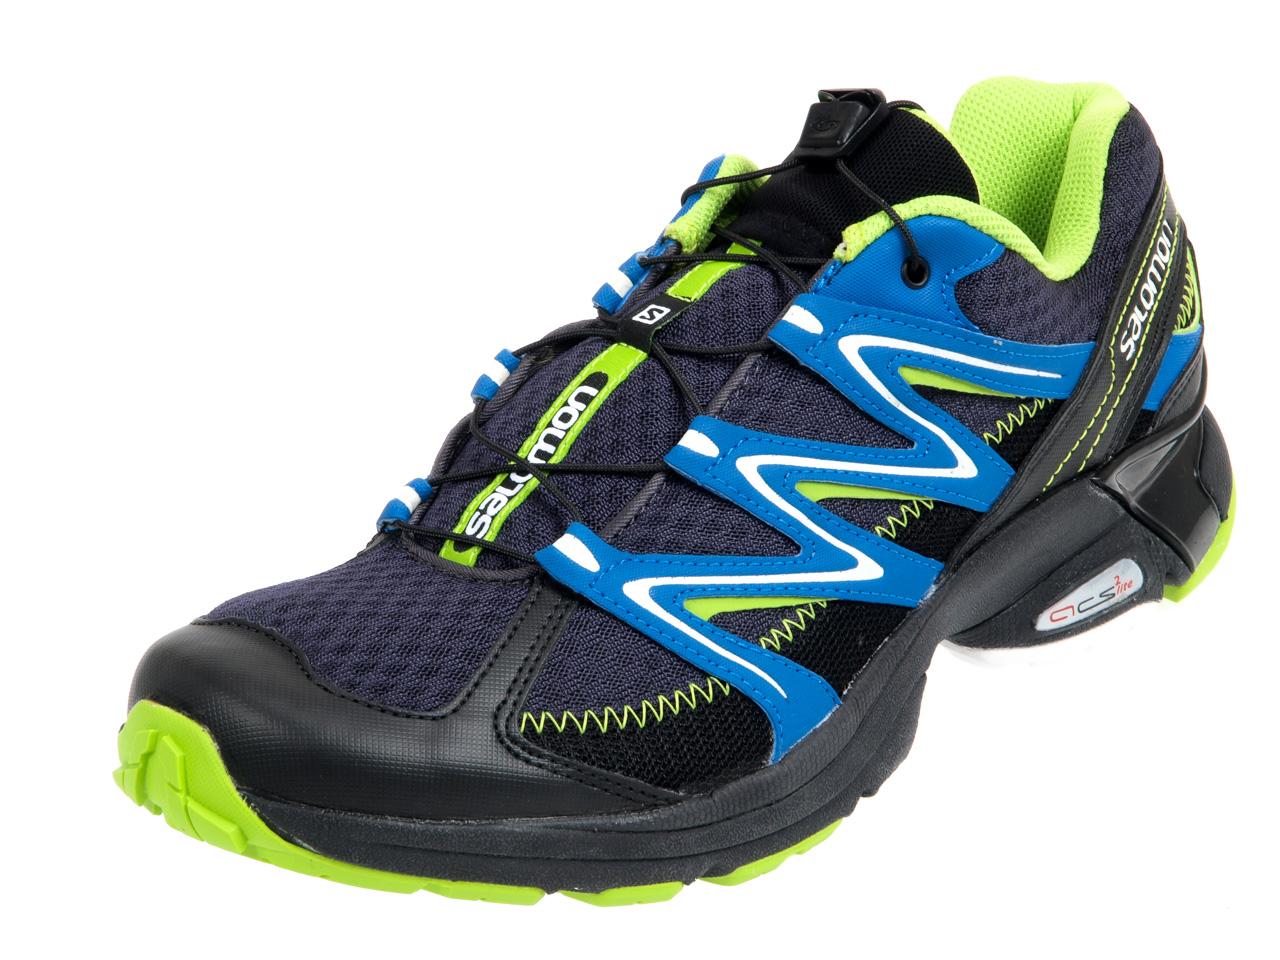 09f491f71f72 Les meilleures chaussures de running du moment en juillet 2019